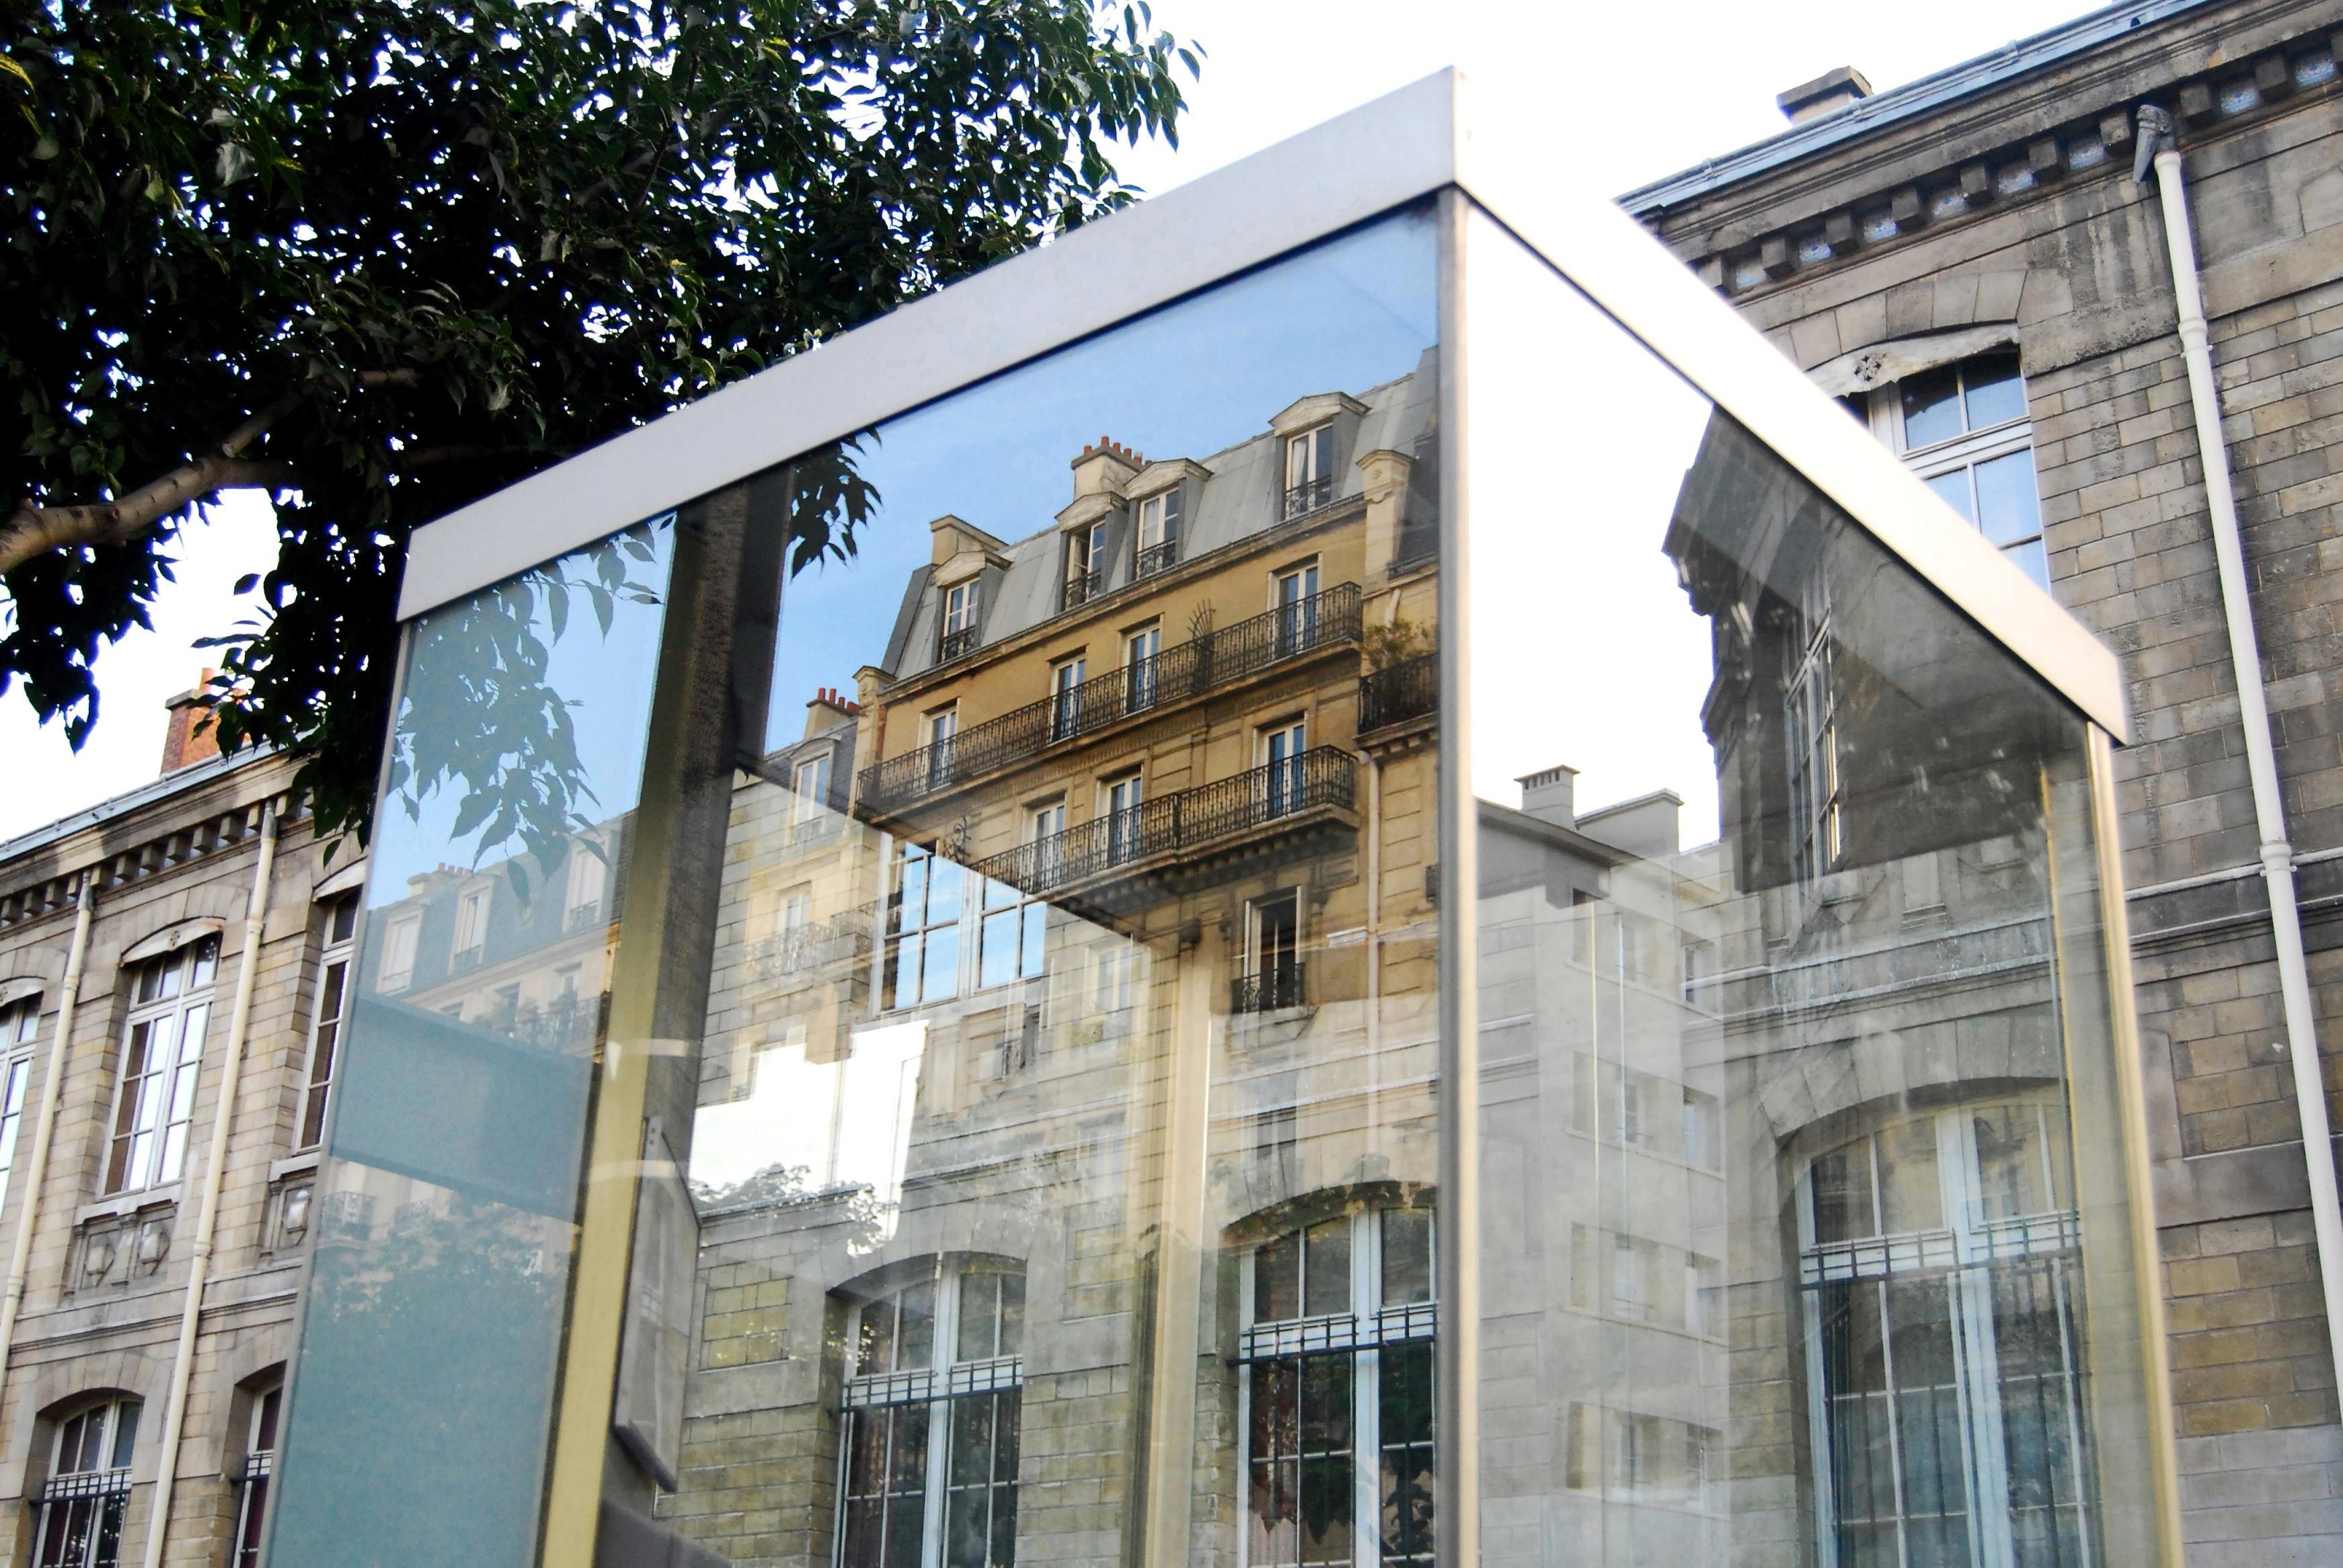 Foto gratis: finestra città architettura casa urbana esterno